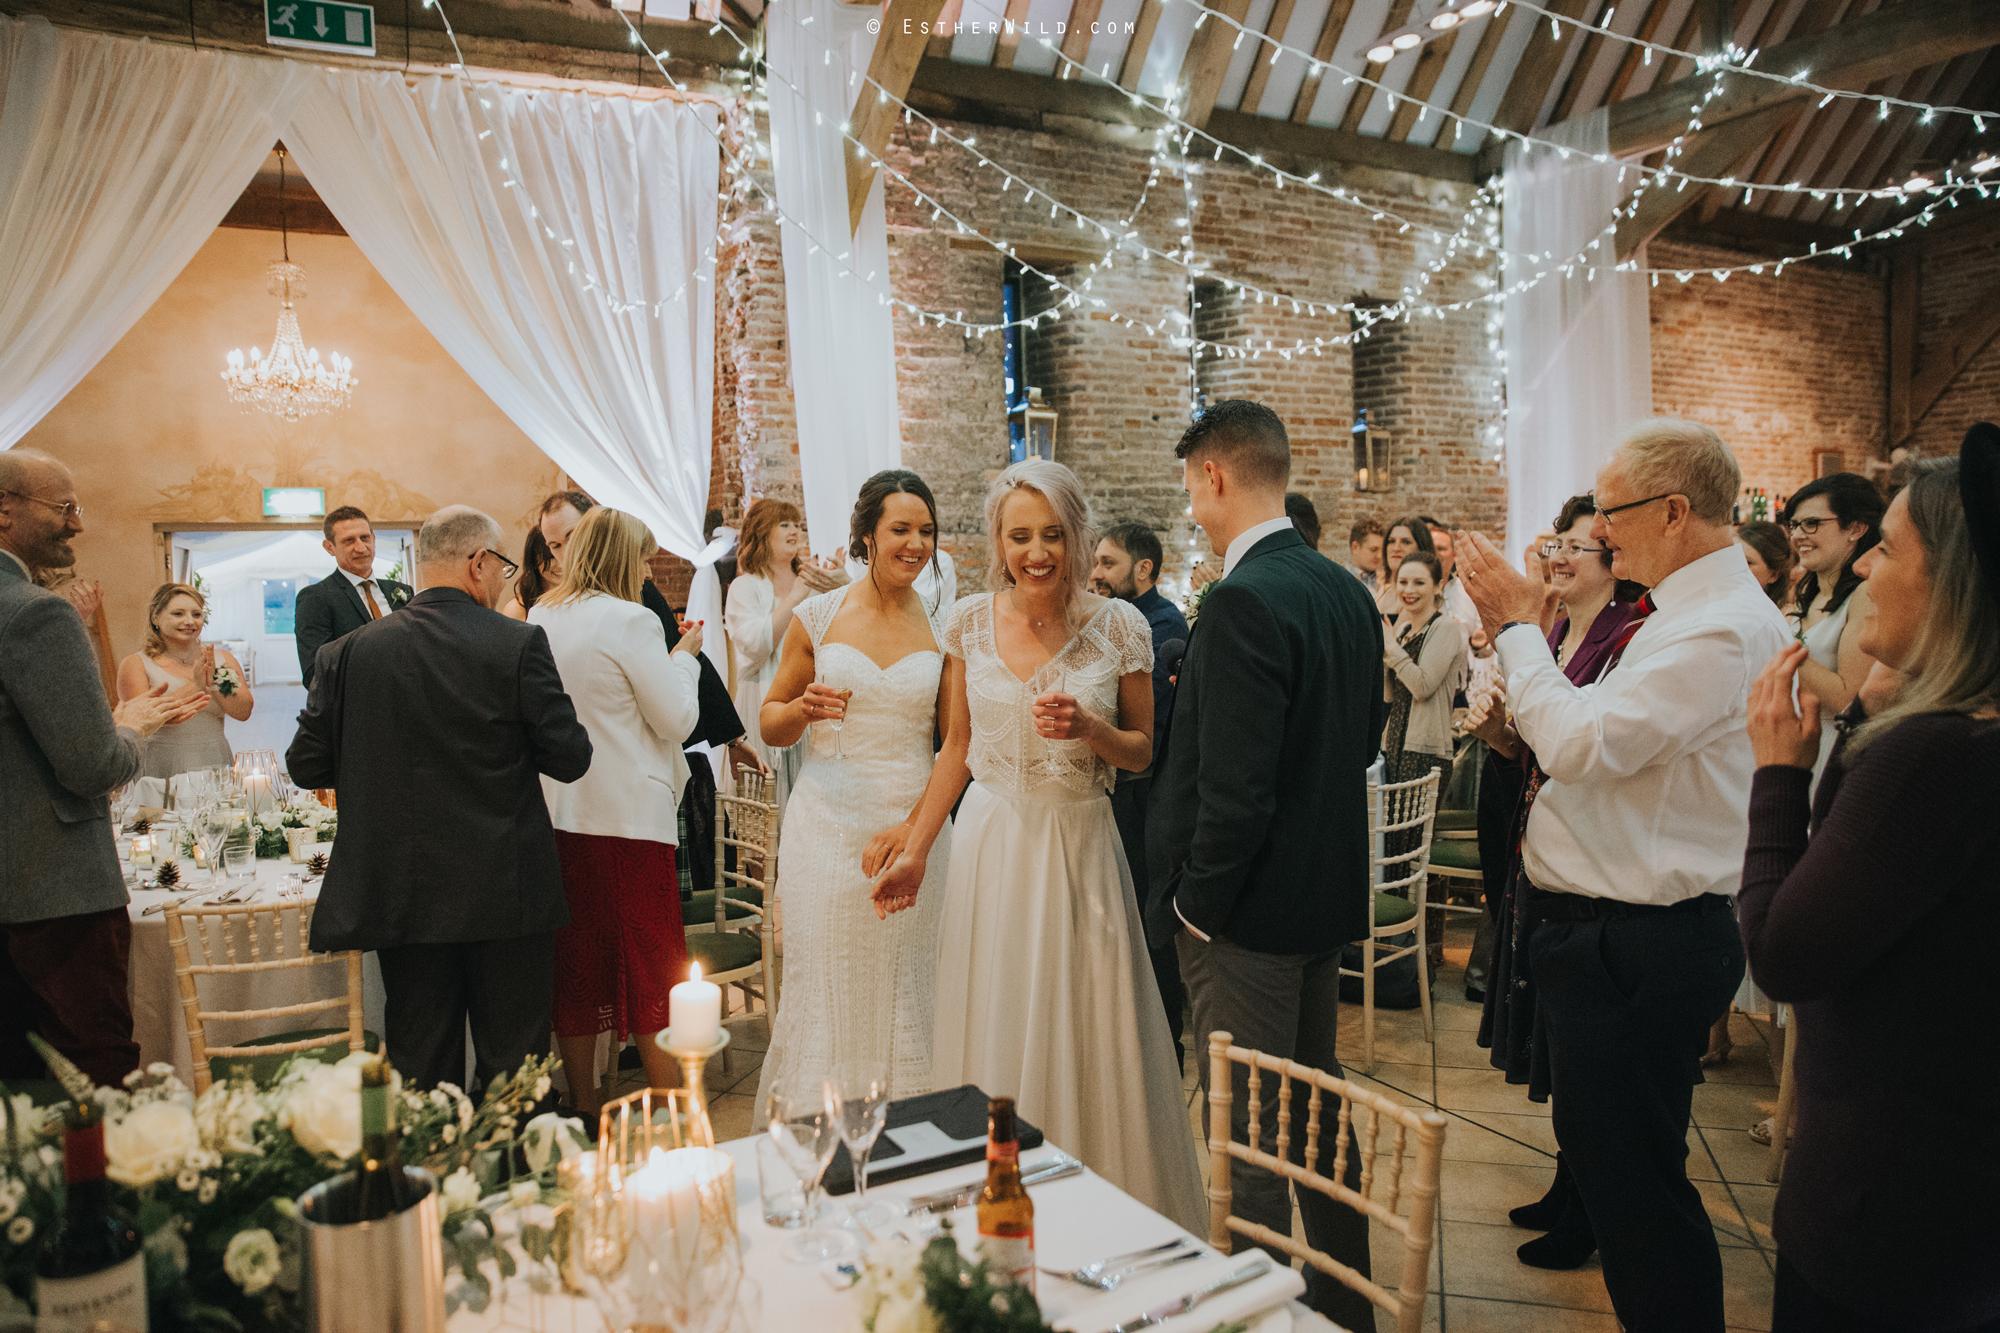 Elms_Barn_Weddings_Suffolk_Photographer_Copyright_Esther_Wild_IMG_2316.jpg